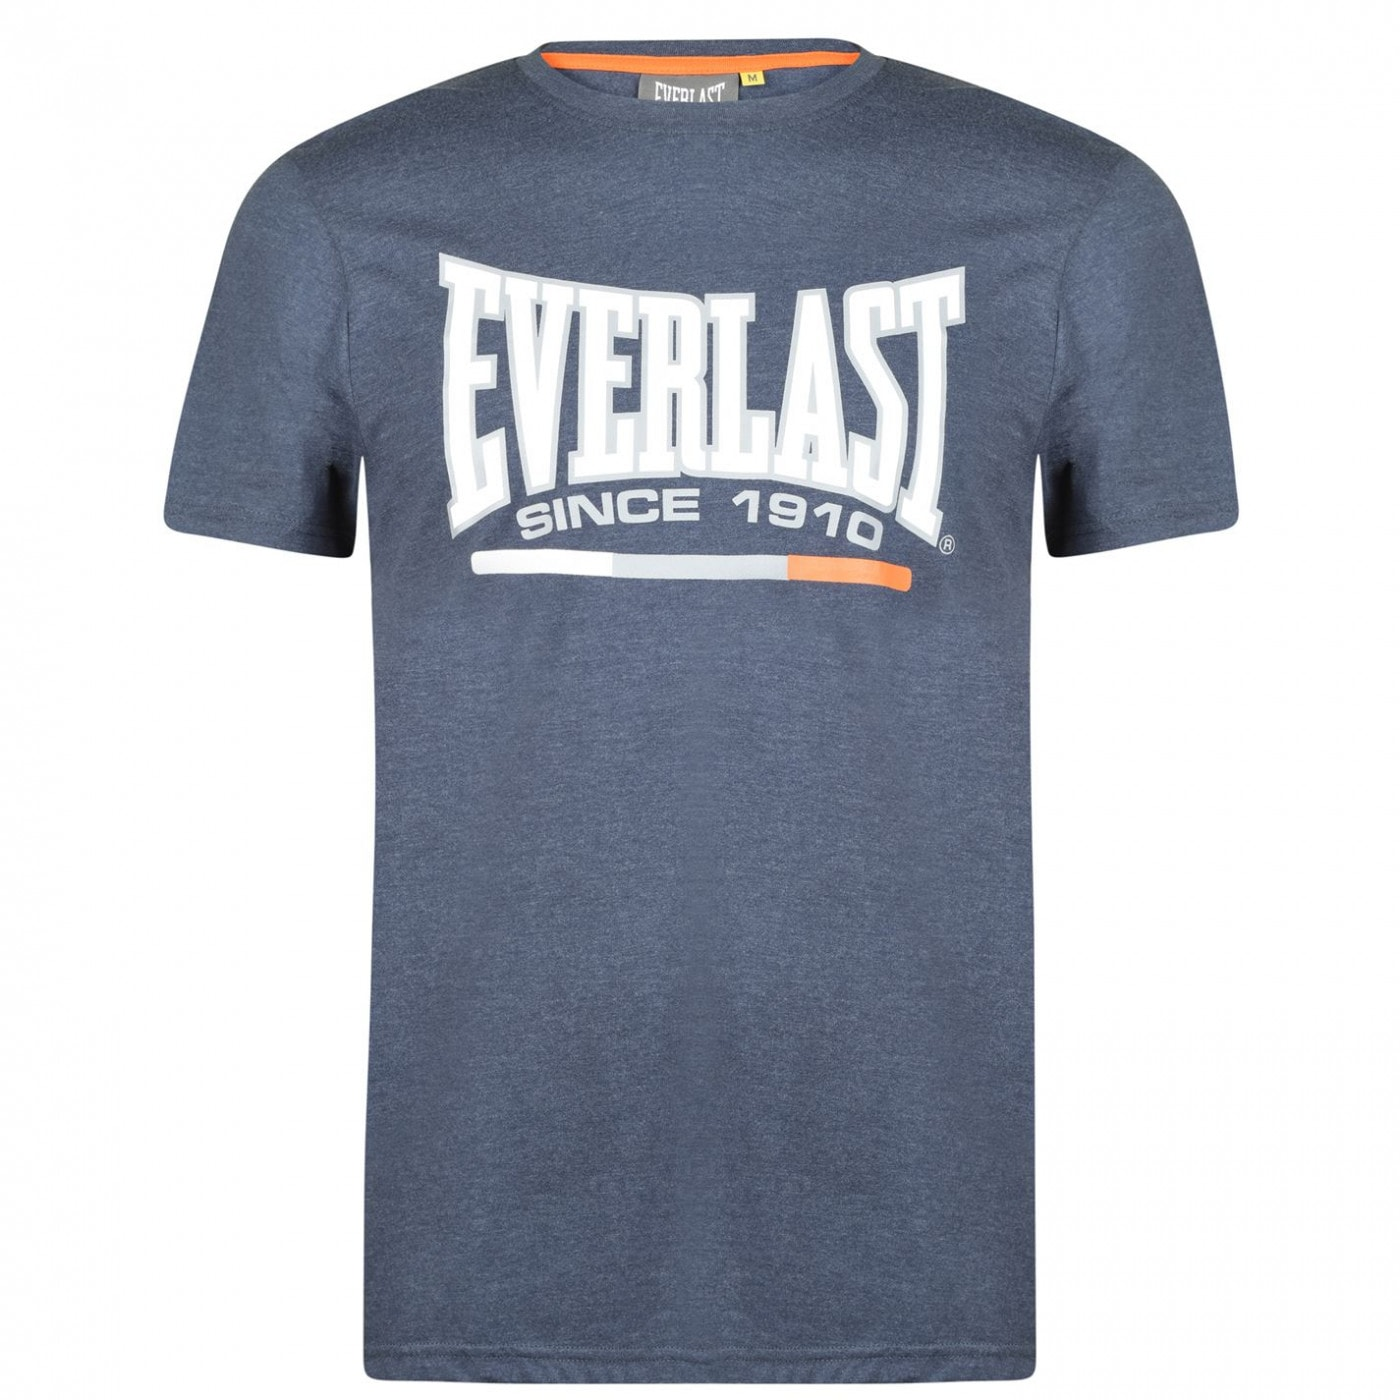 Everlast 3 Colour T-Shirt Mens